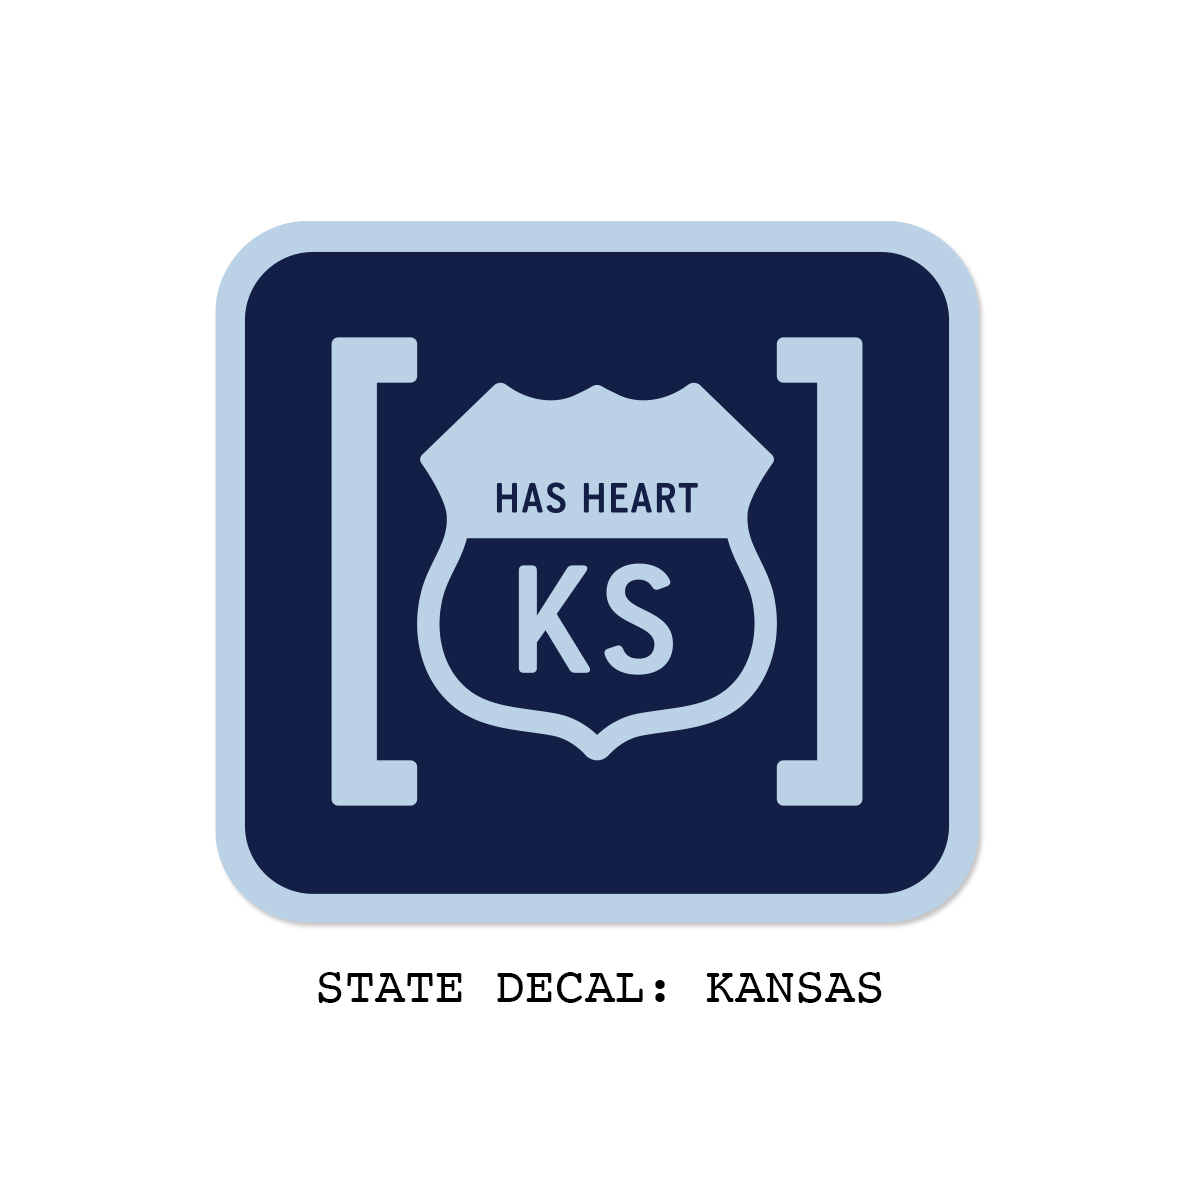 hasheart-statedecal-KS